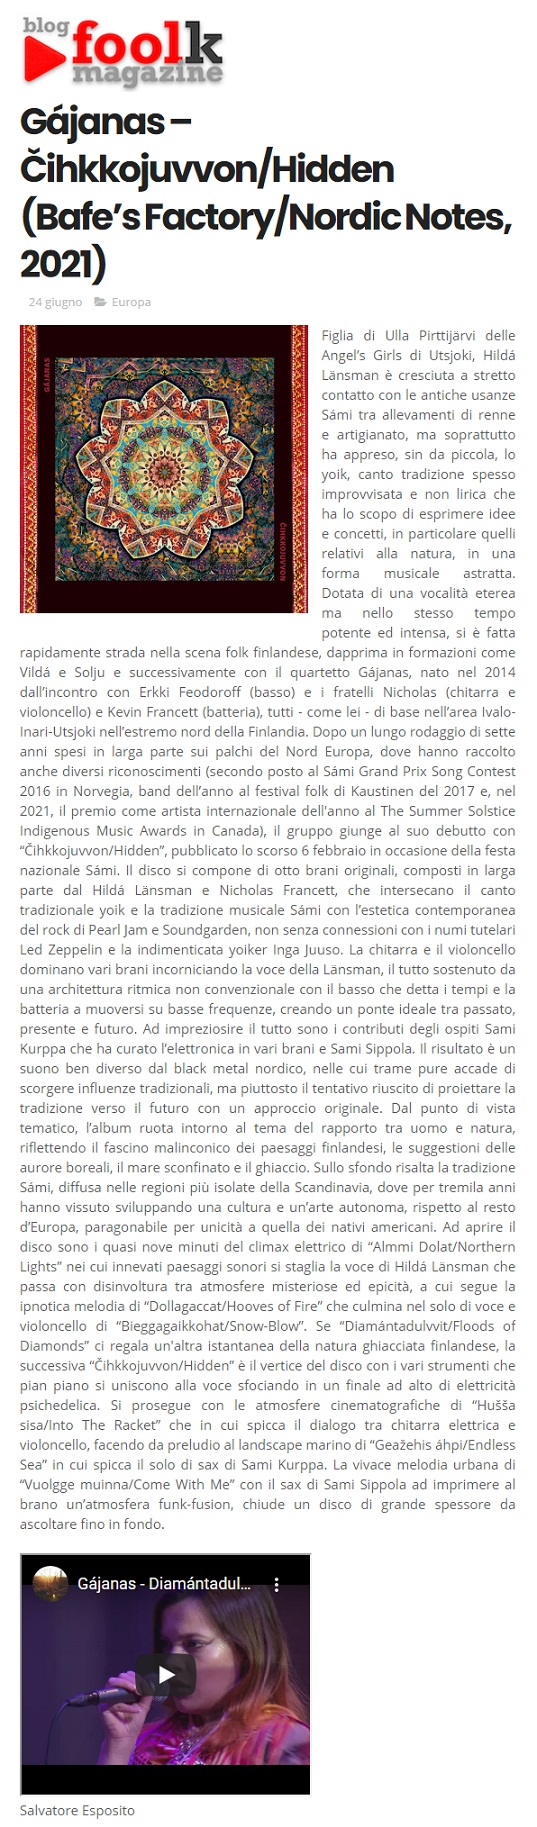 Blogfoolk (Italy), 24.6.2021